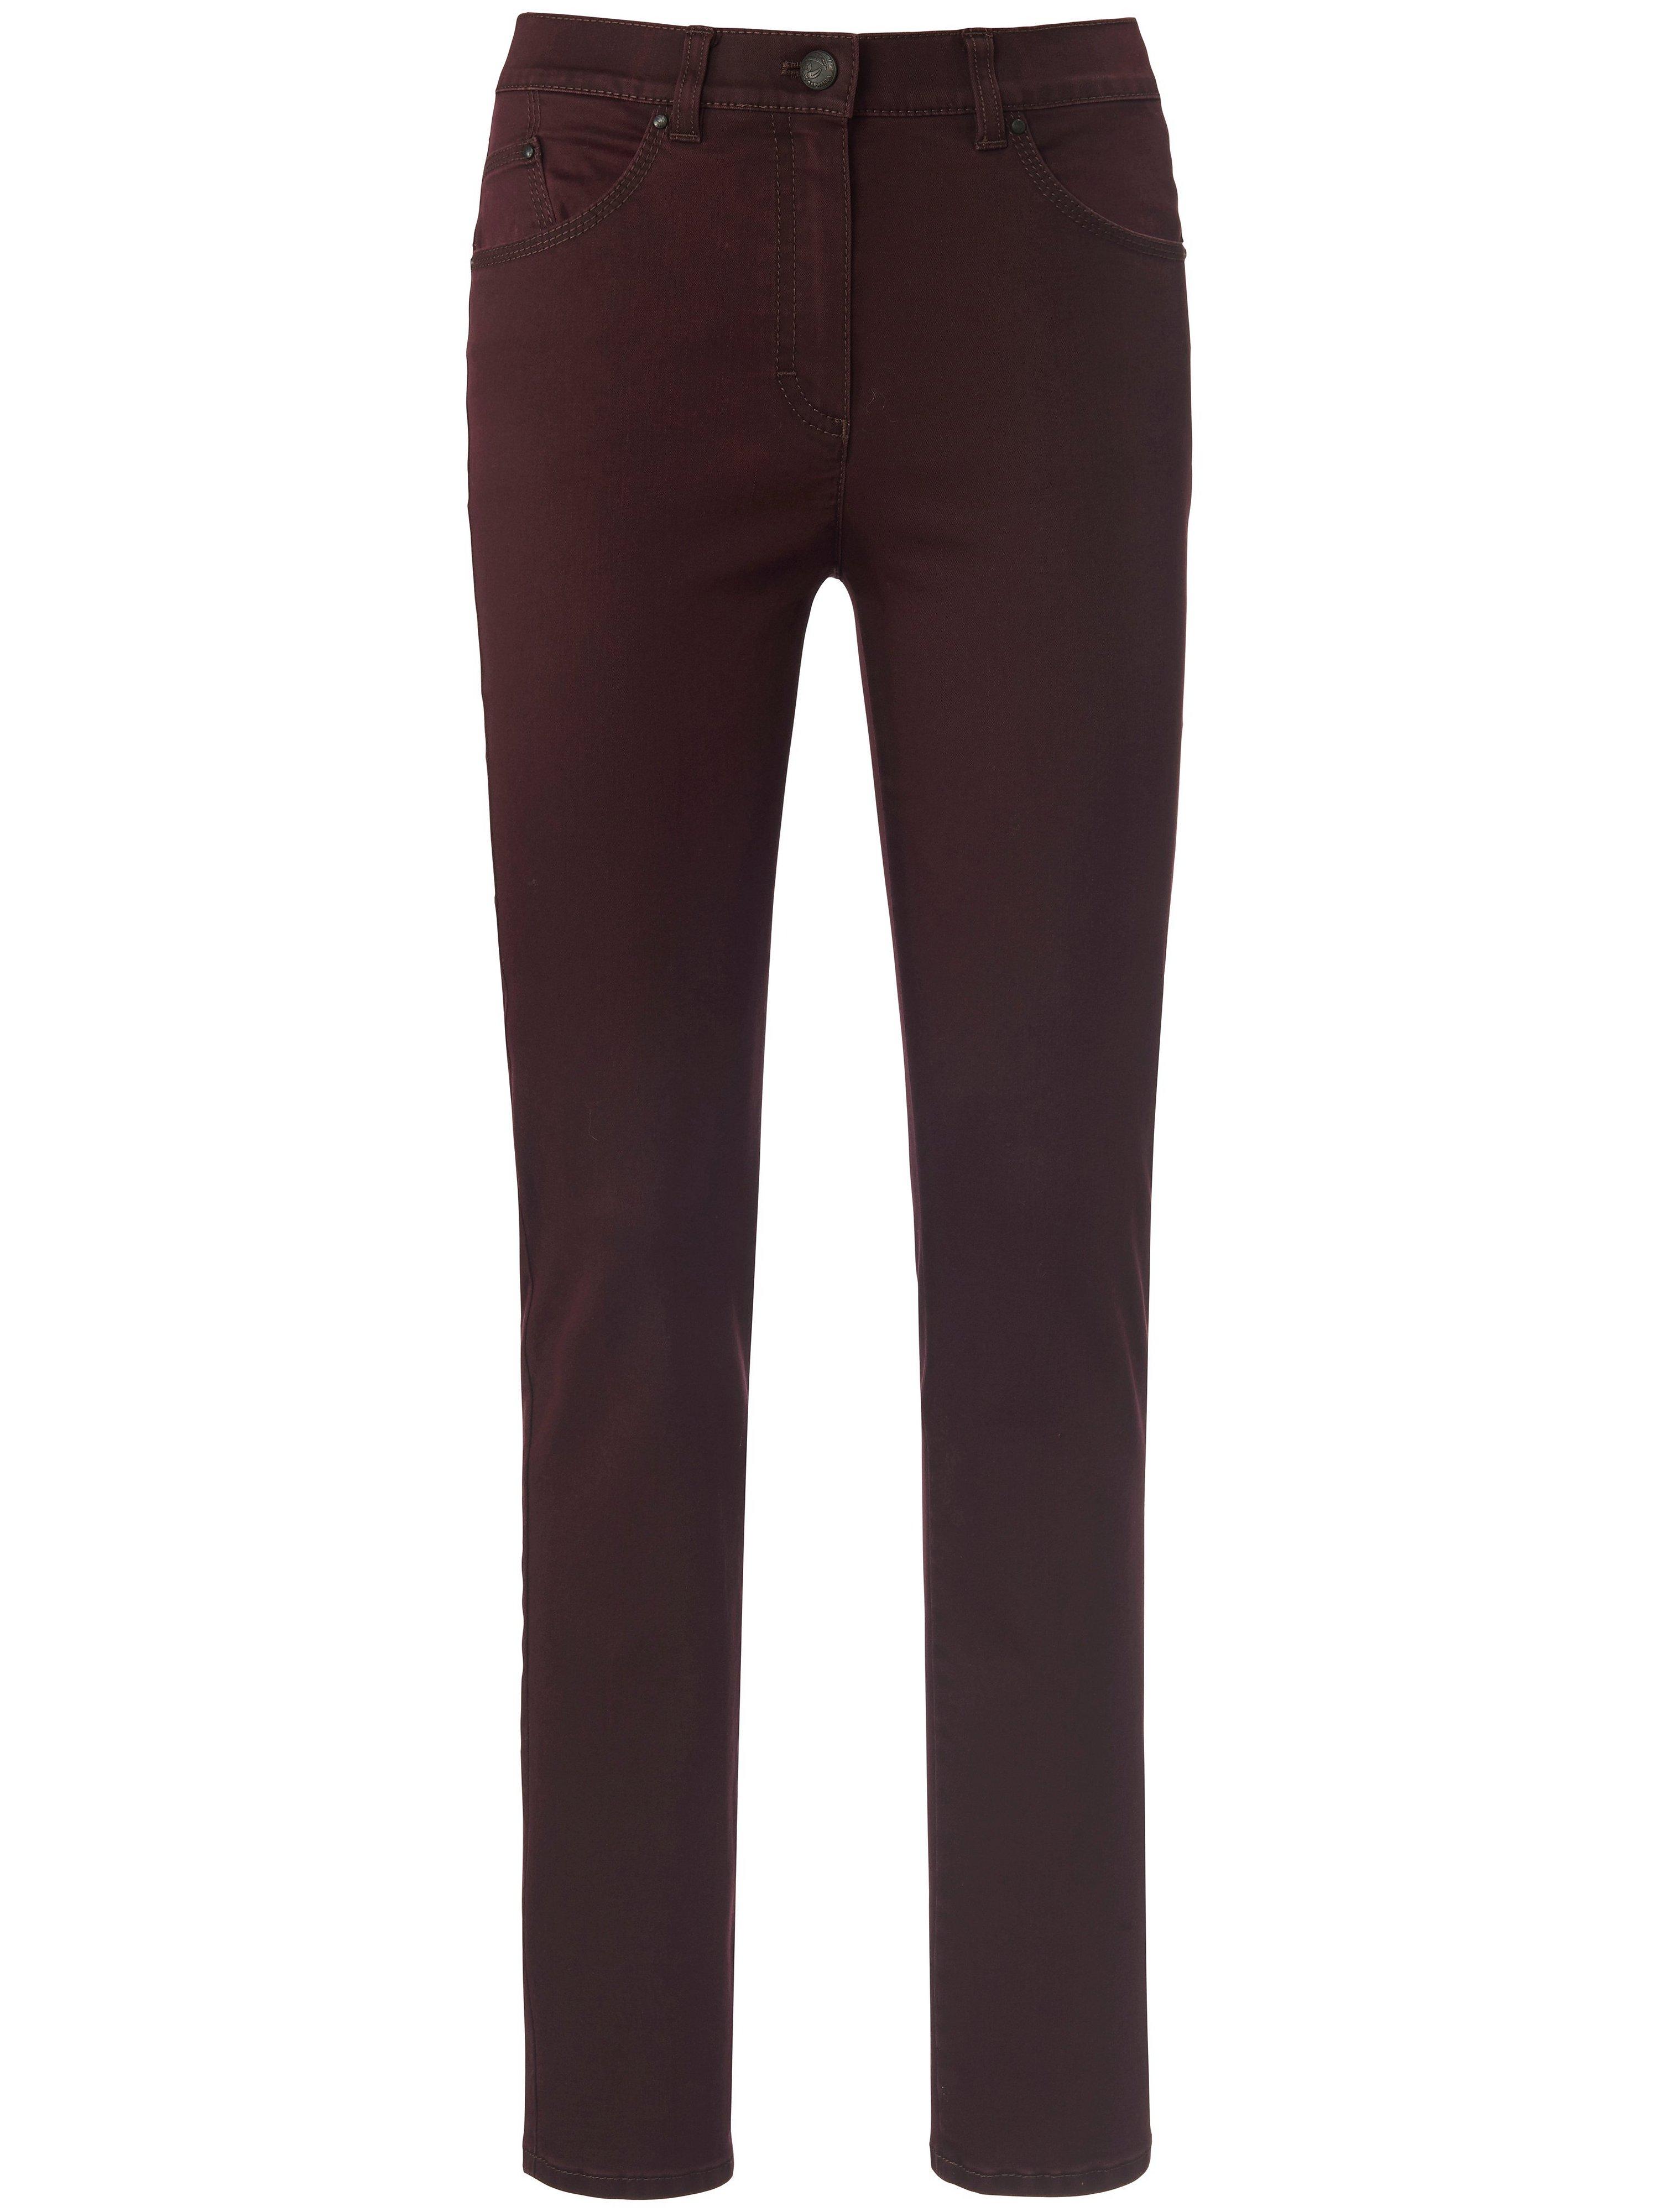 Corrigerende Proform S Super Slim-jeans model Lea Van Raphaela by Brax rood